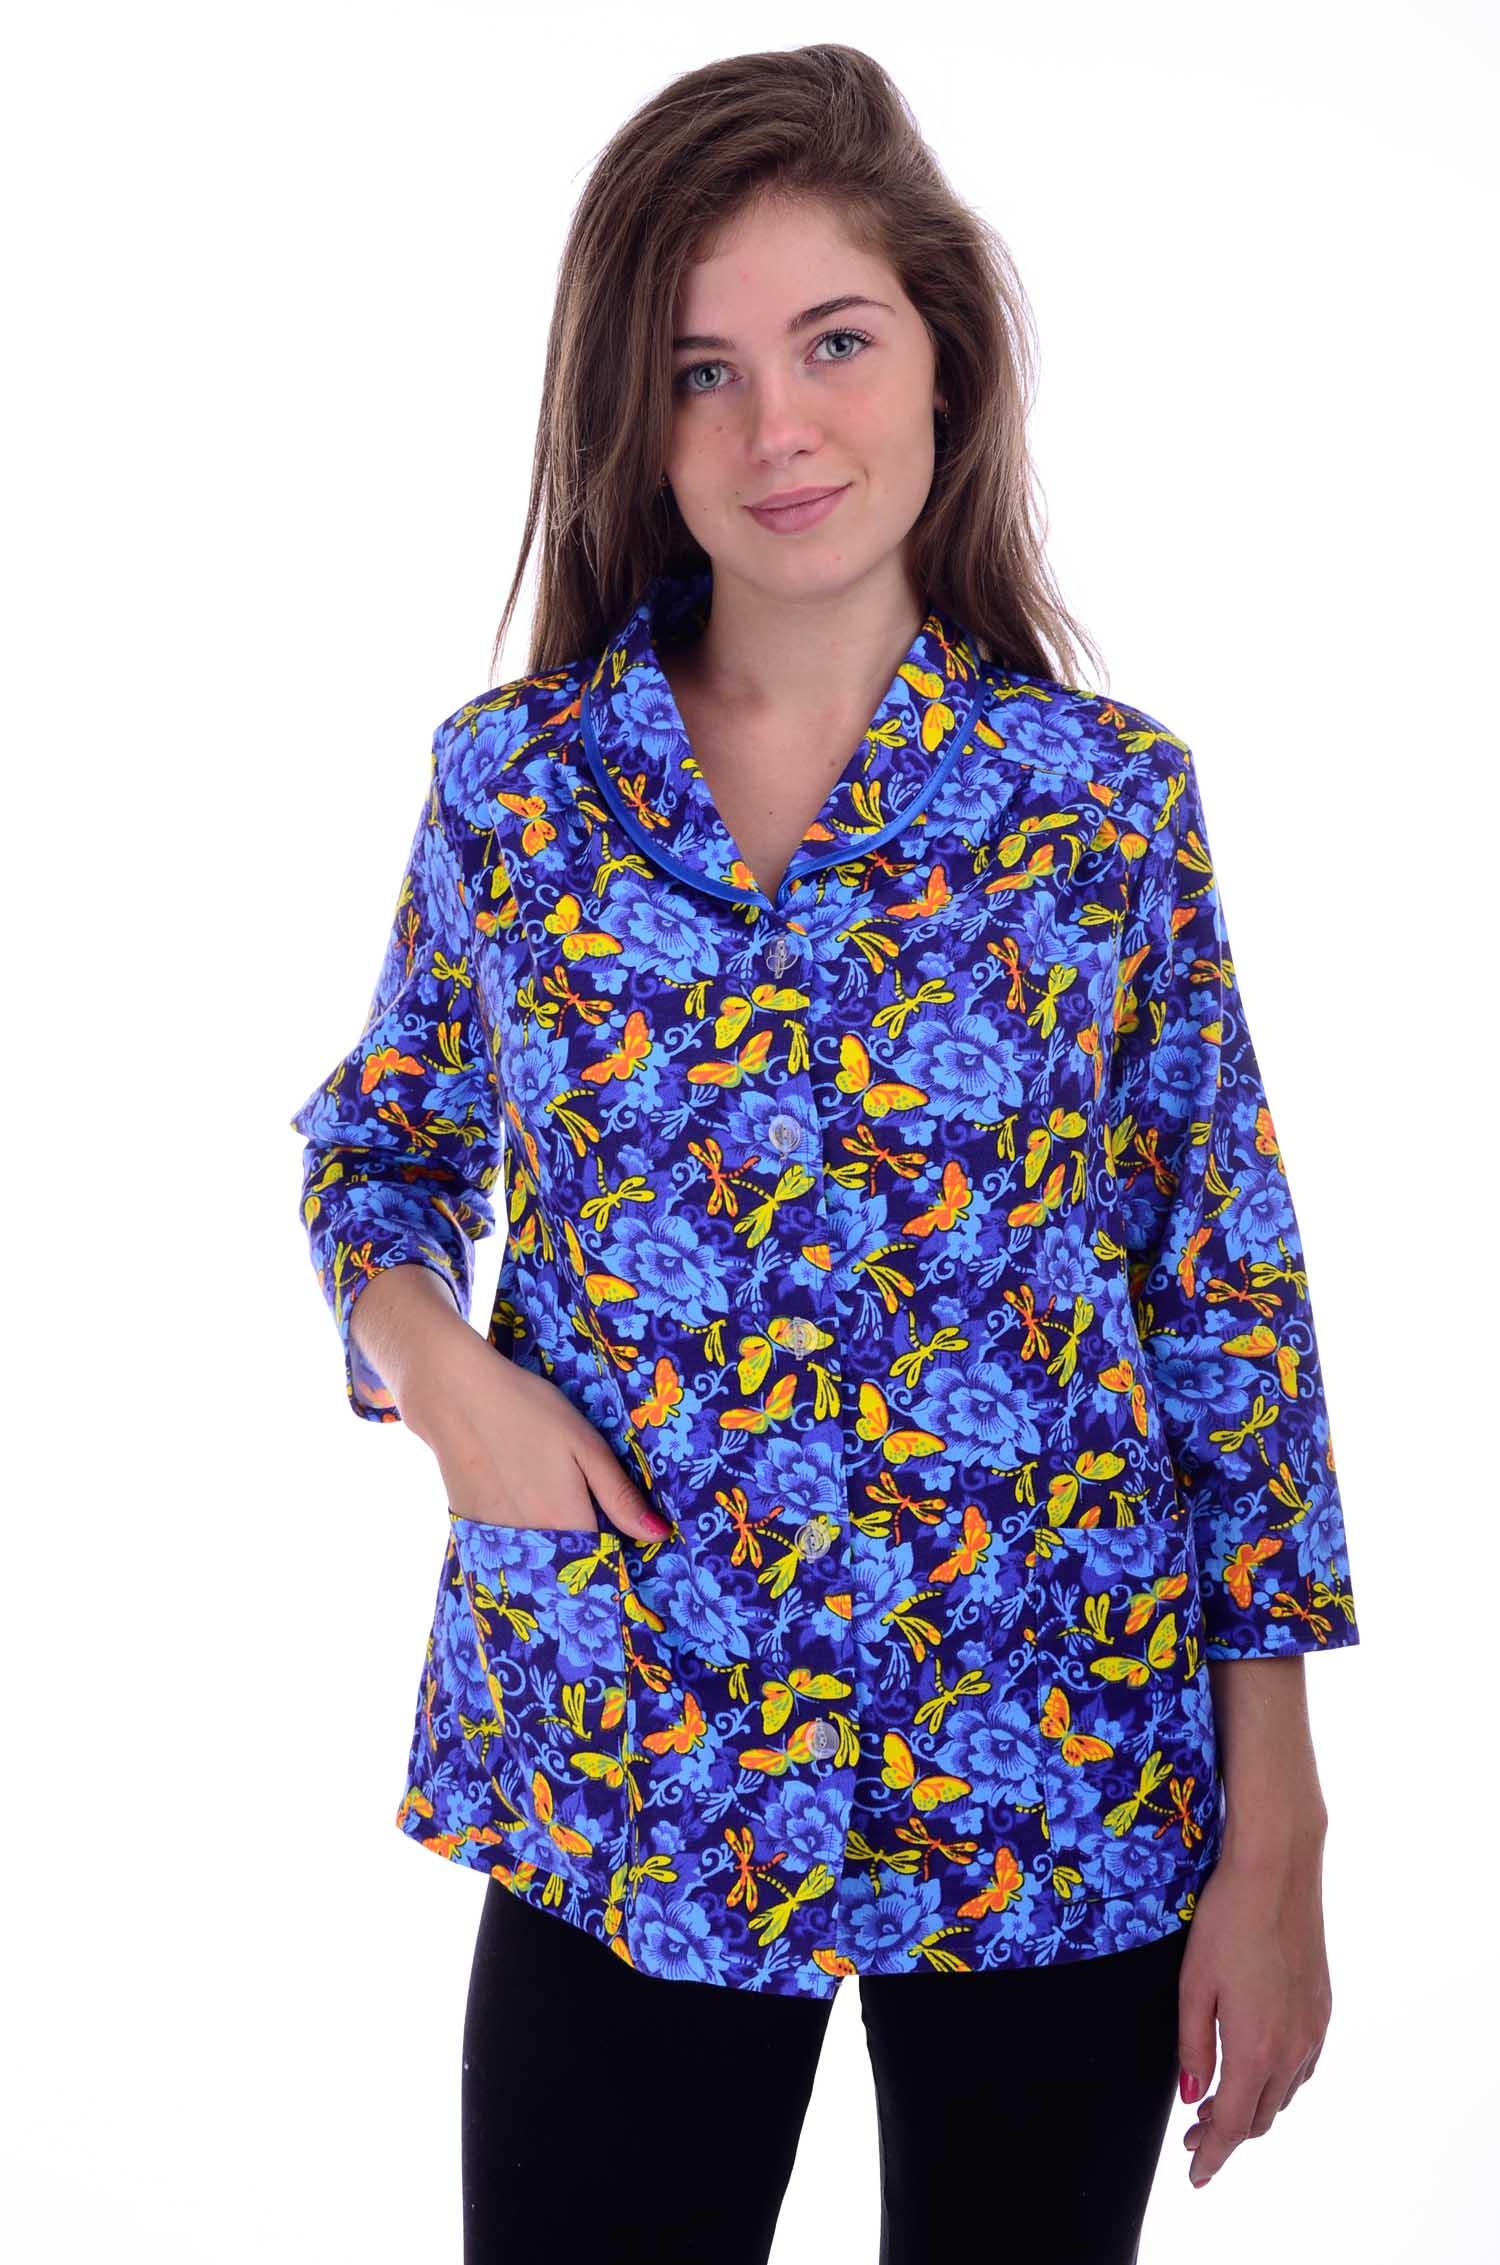 Кофта женская Фланелевая на пуговицахКофты, свитера, толстовки<br><br><br>Размер: 54